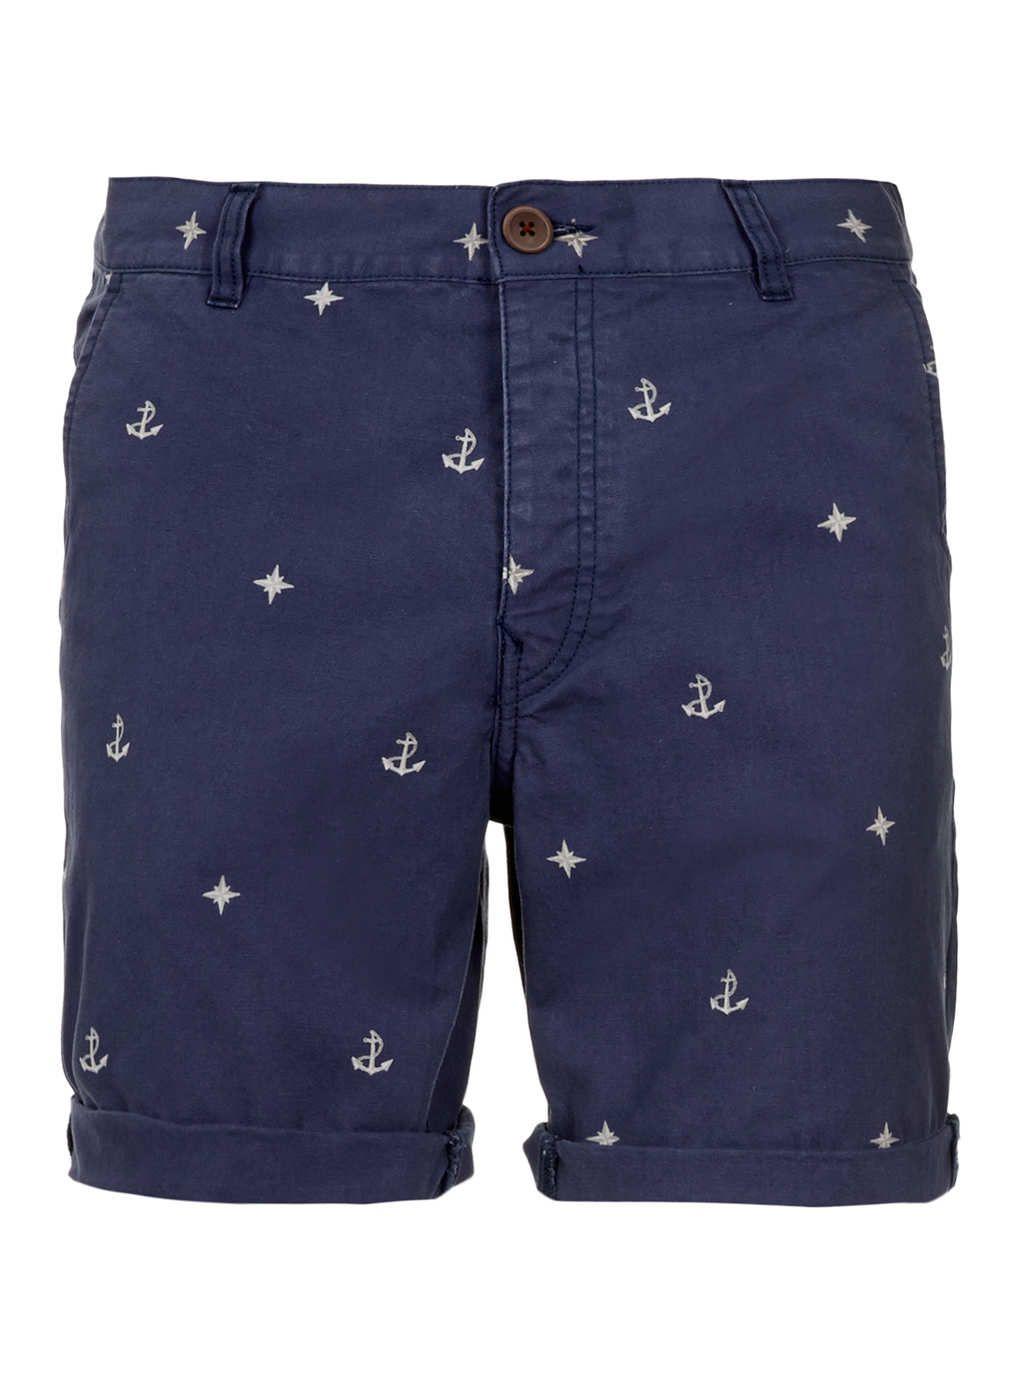 c12b63e0b1e4 Blue Nautical Motif Shorts - Men s Shorts - Clothing - TOPMAN USA ...